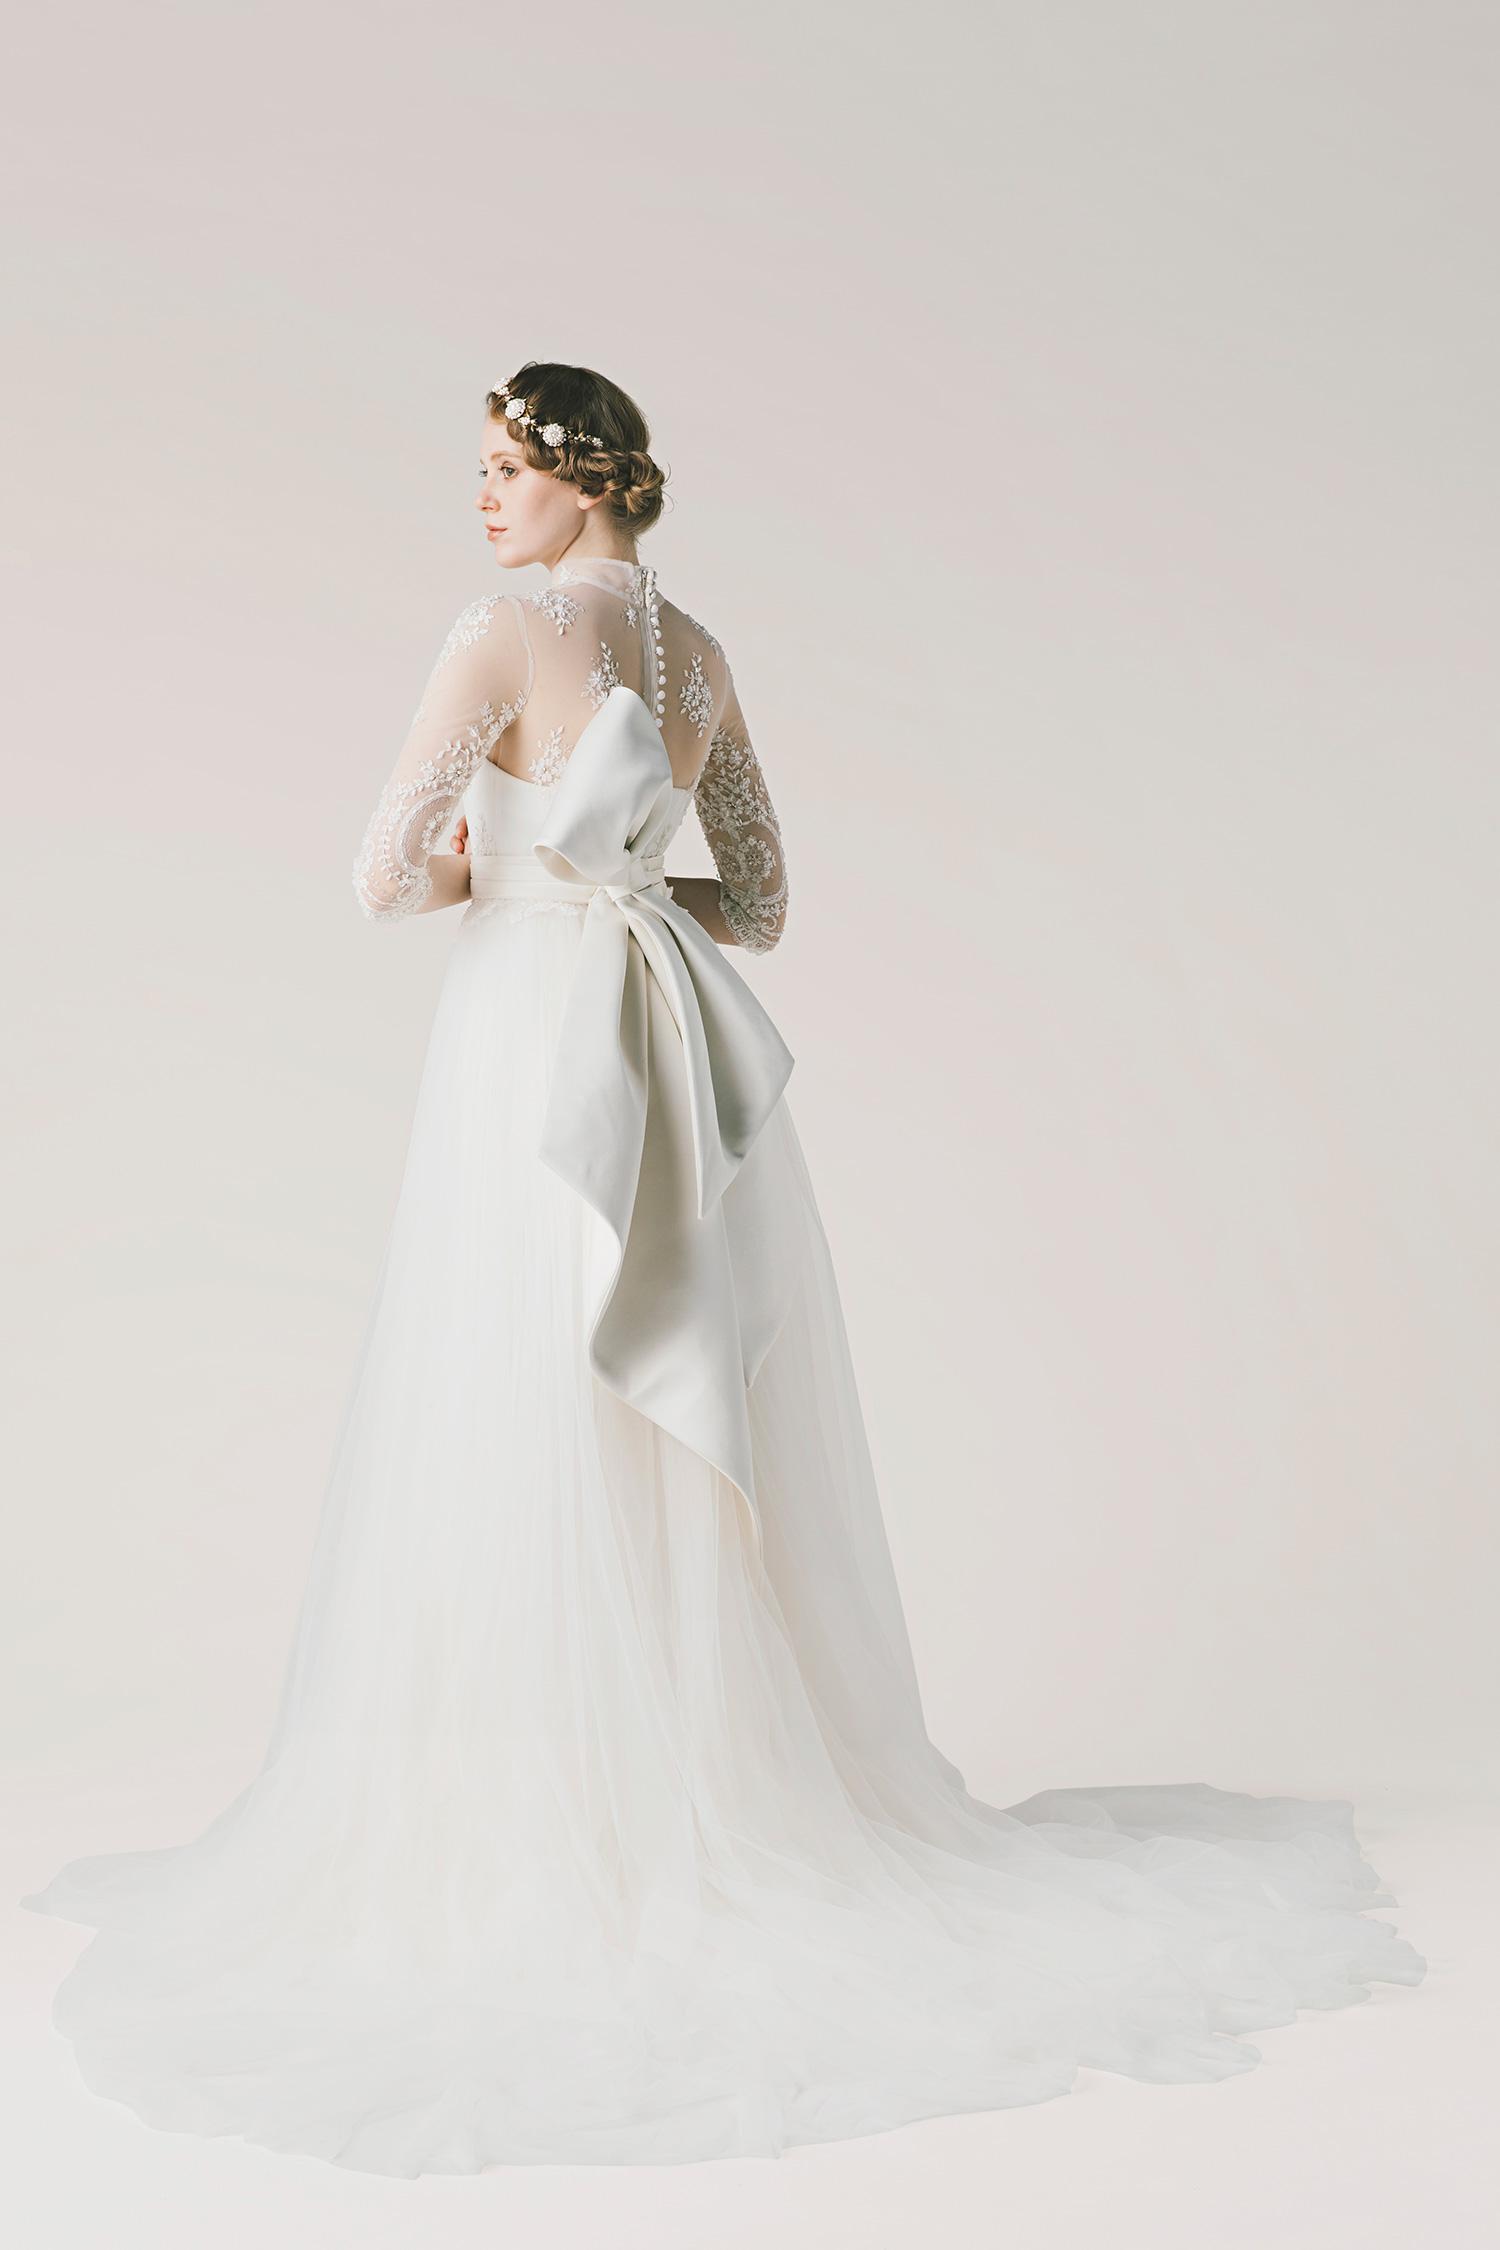 0408_Wedding_3273